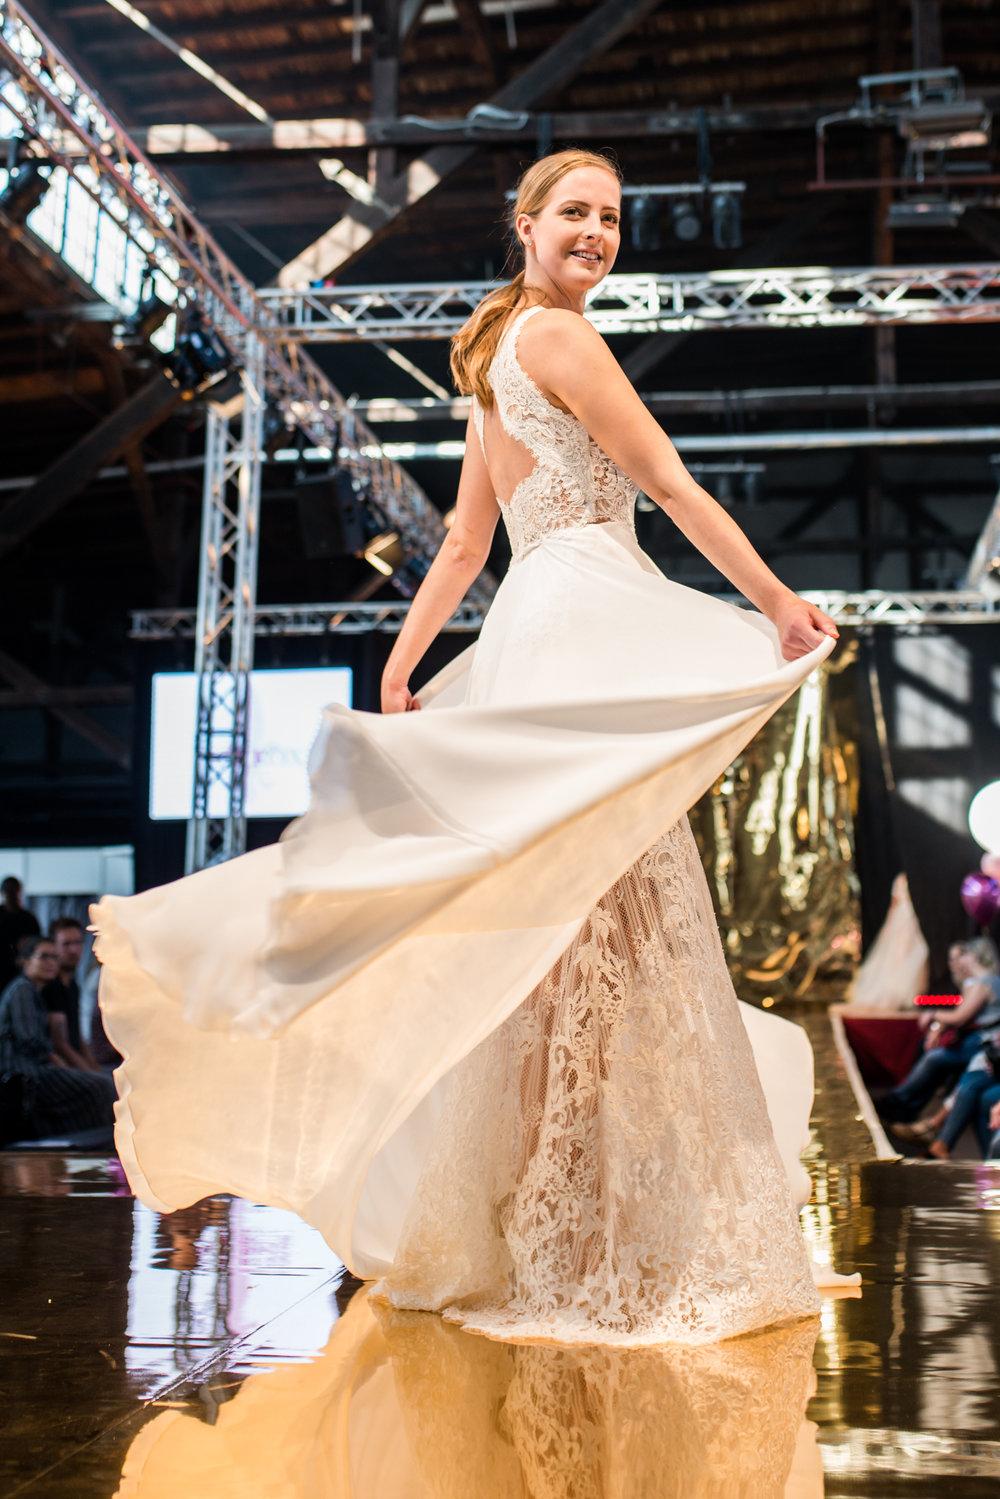 torrox-fashionshow-7.jpg